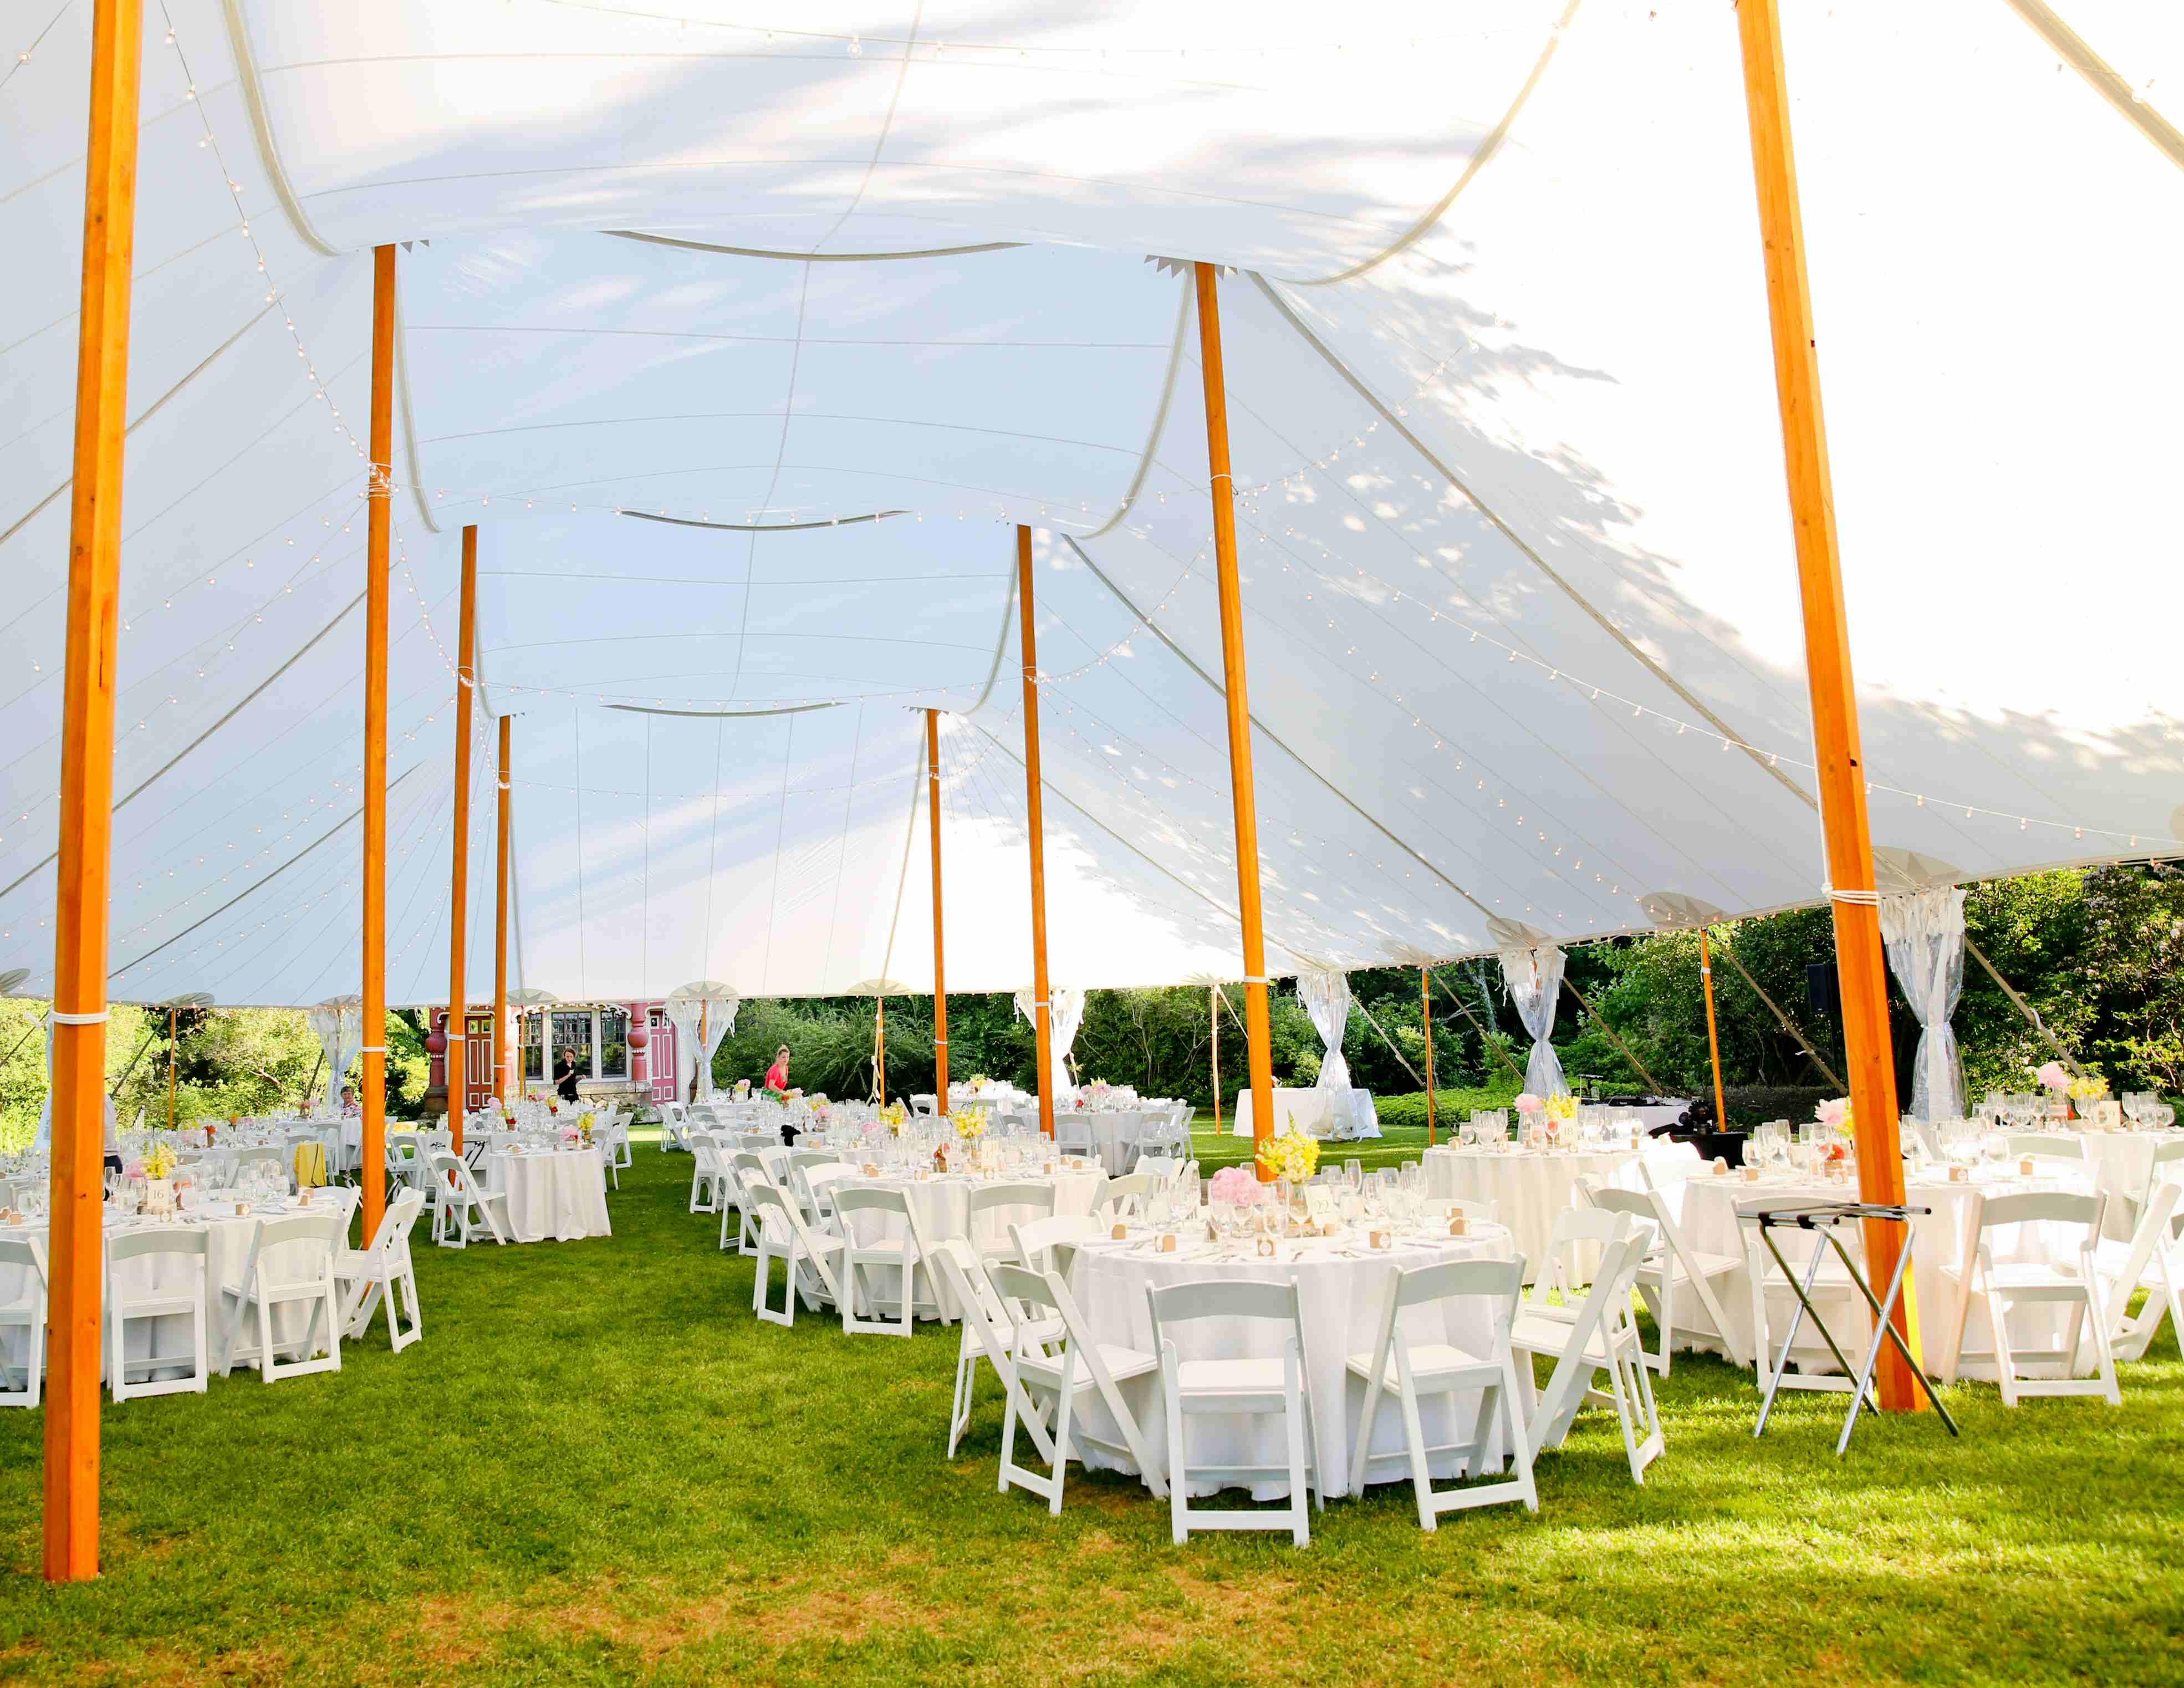 sailcloth beach chairs arne jacobsen egg chair tidewater tent rentals 59x119 with white garden